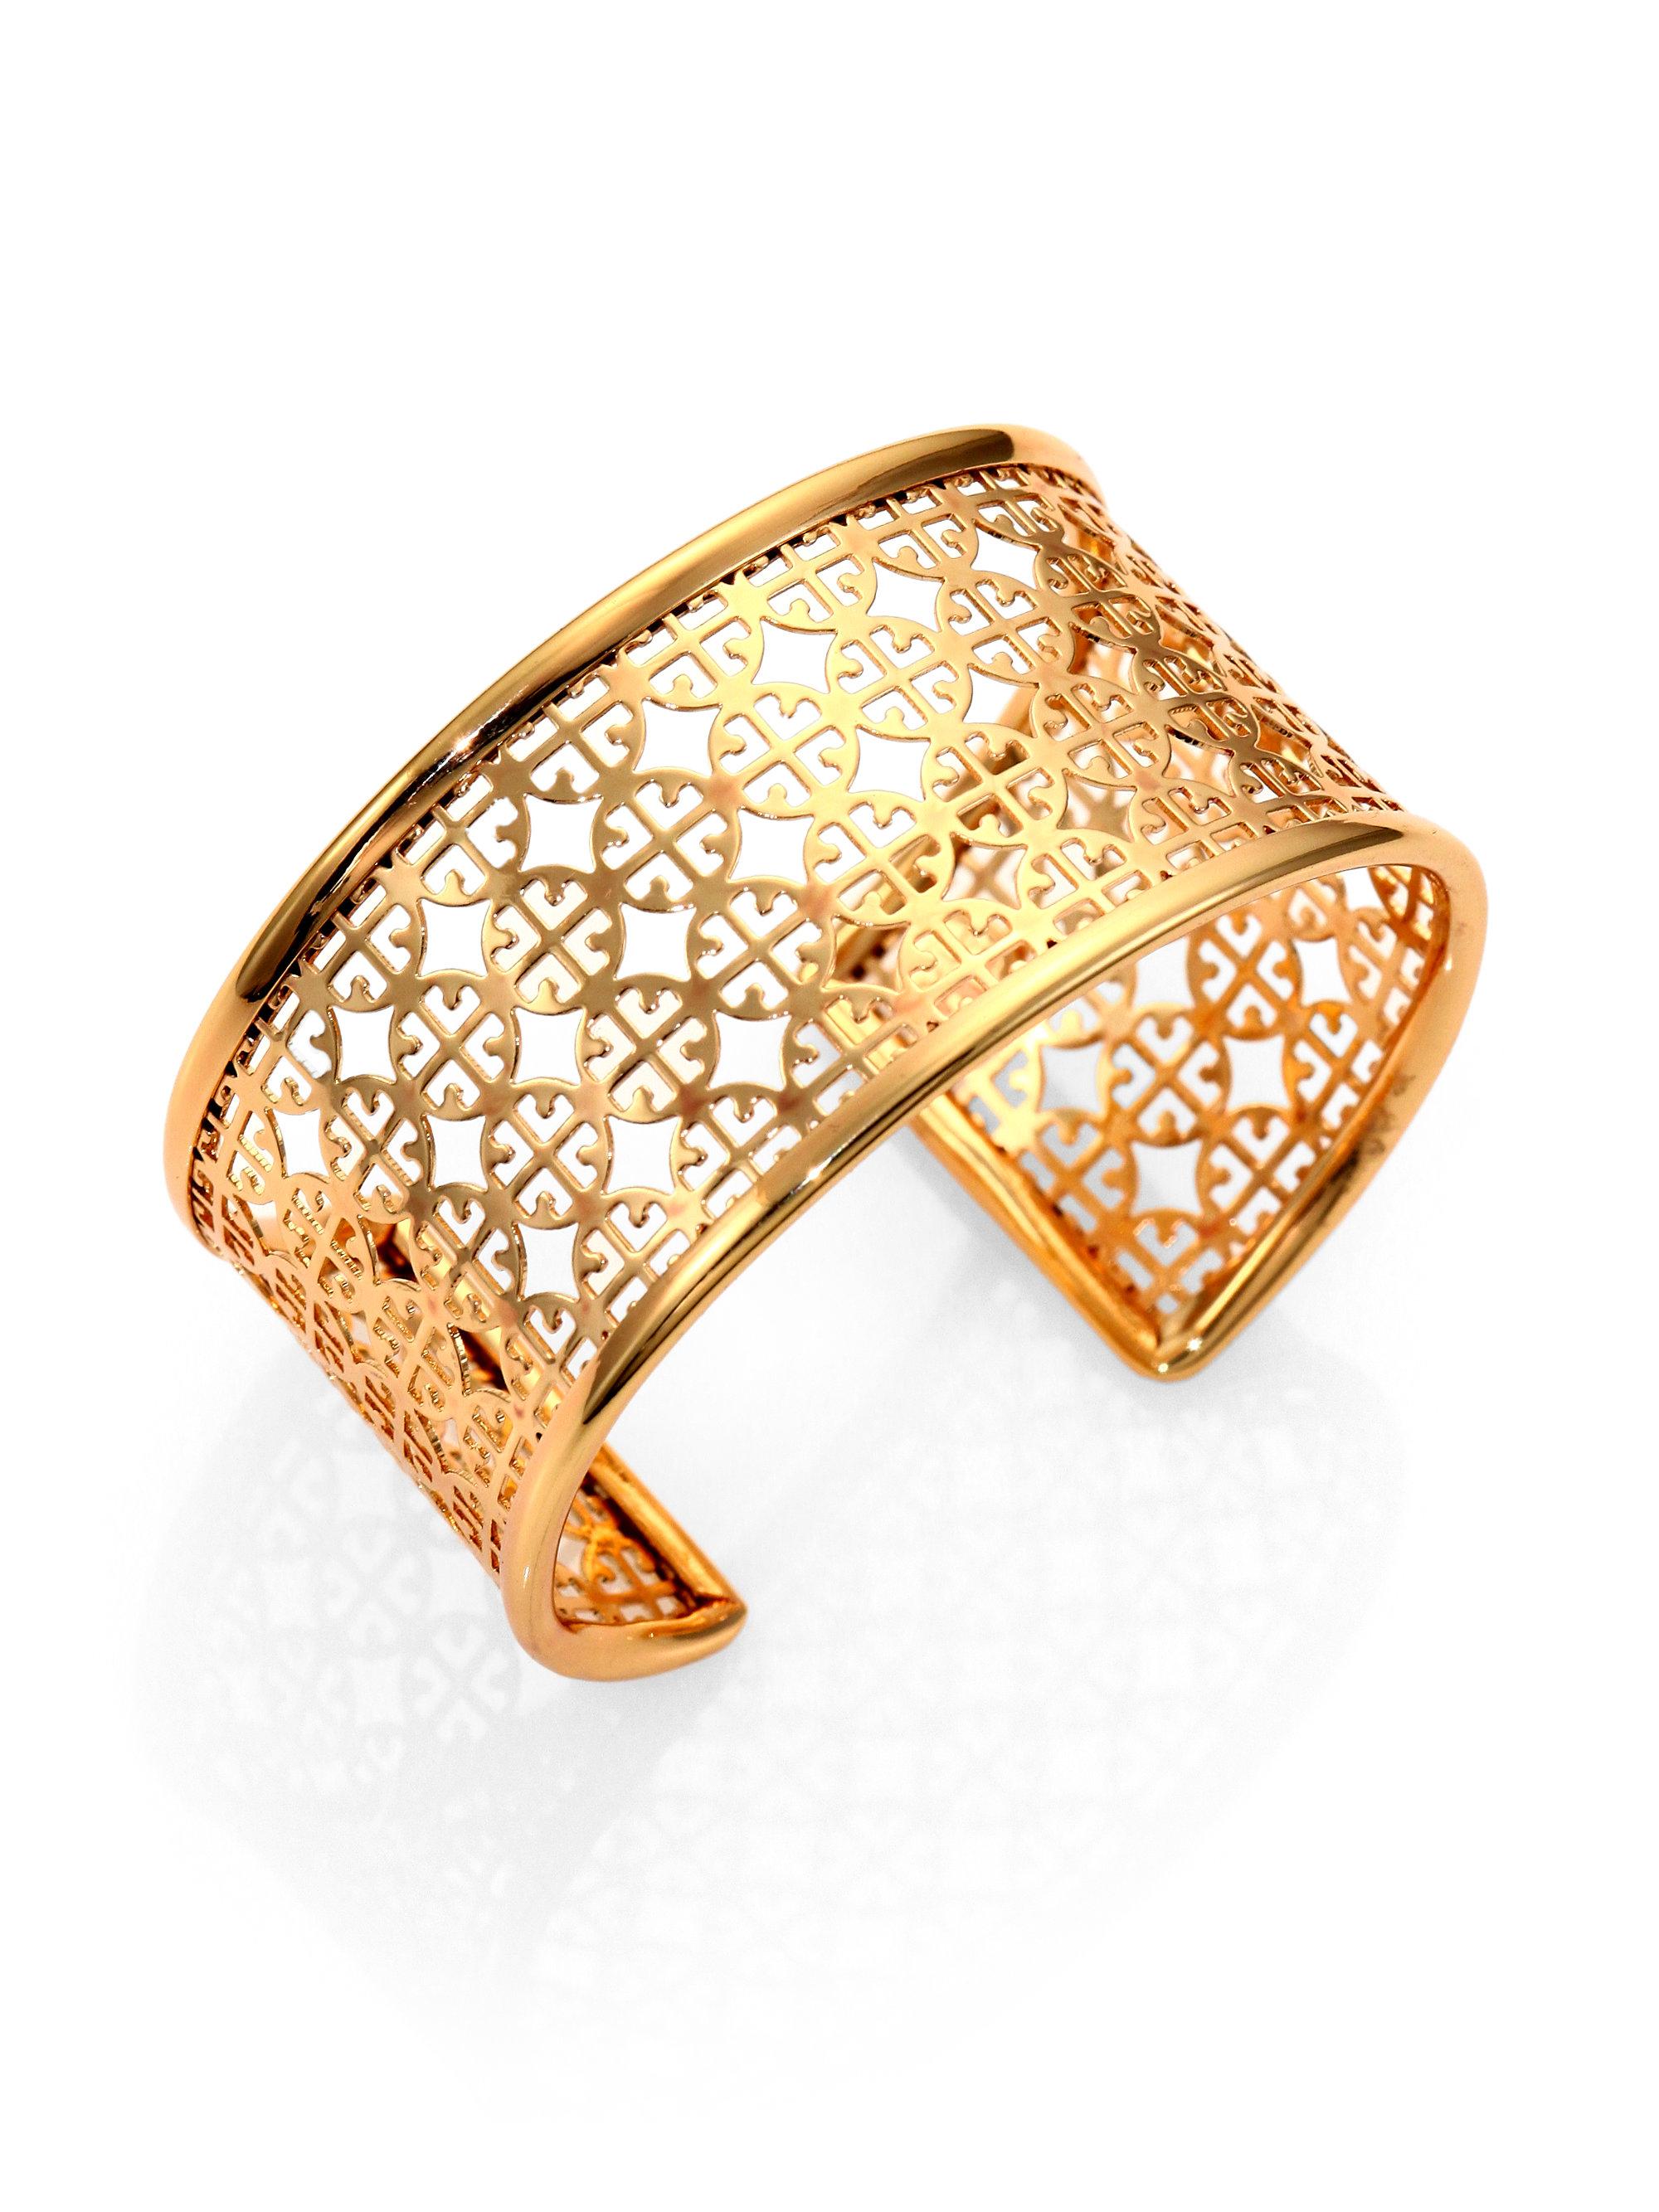 Lyst Tory Burch Perforated Logo Cuff Bracelet In Metallic